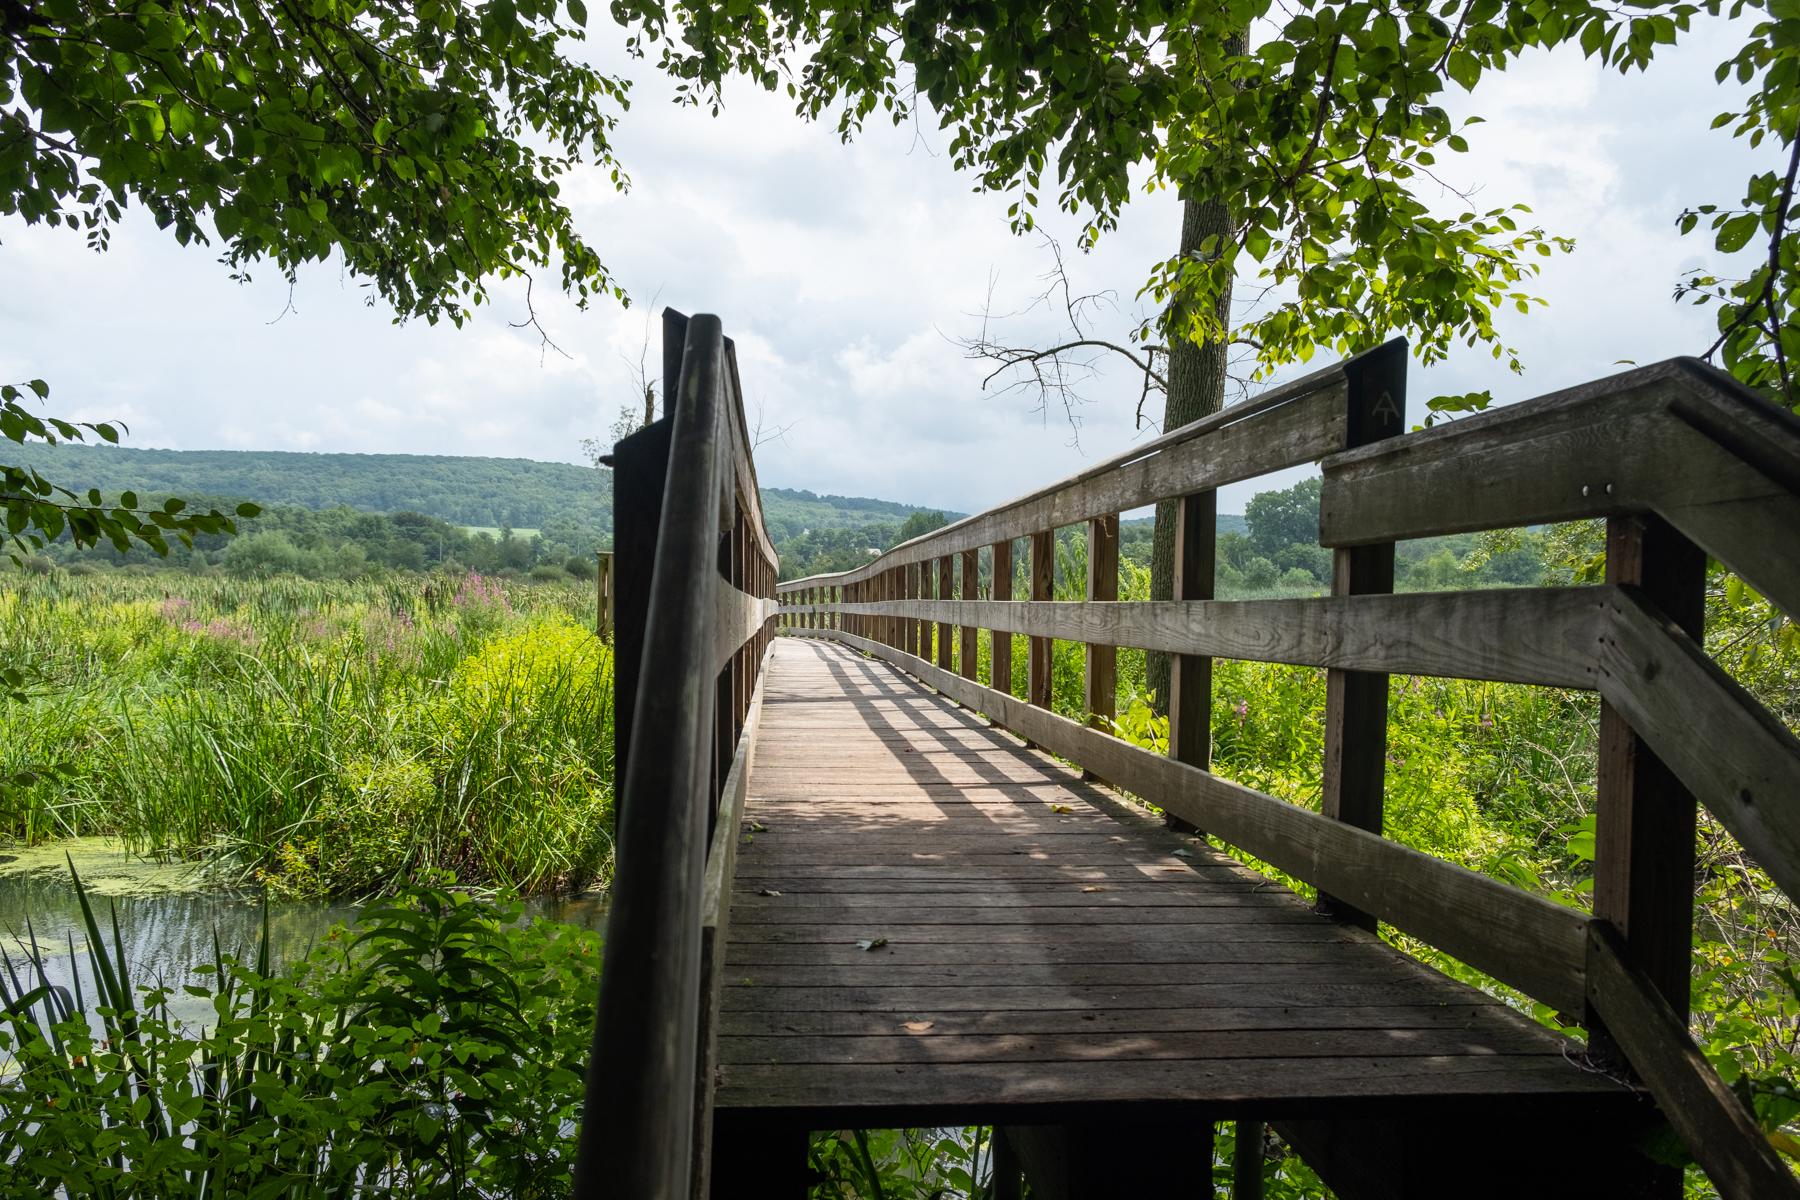 PUBLIC TRANSIT SERIES #14 - Appalachian Trail, Pawling, NY